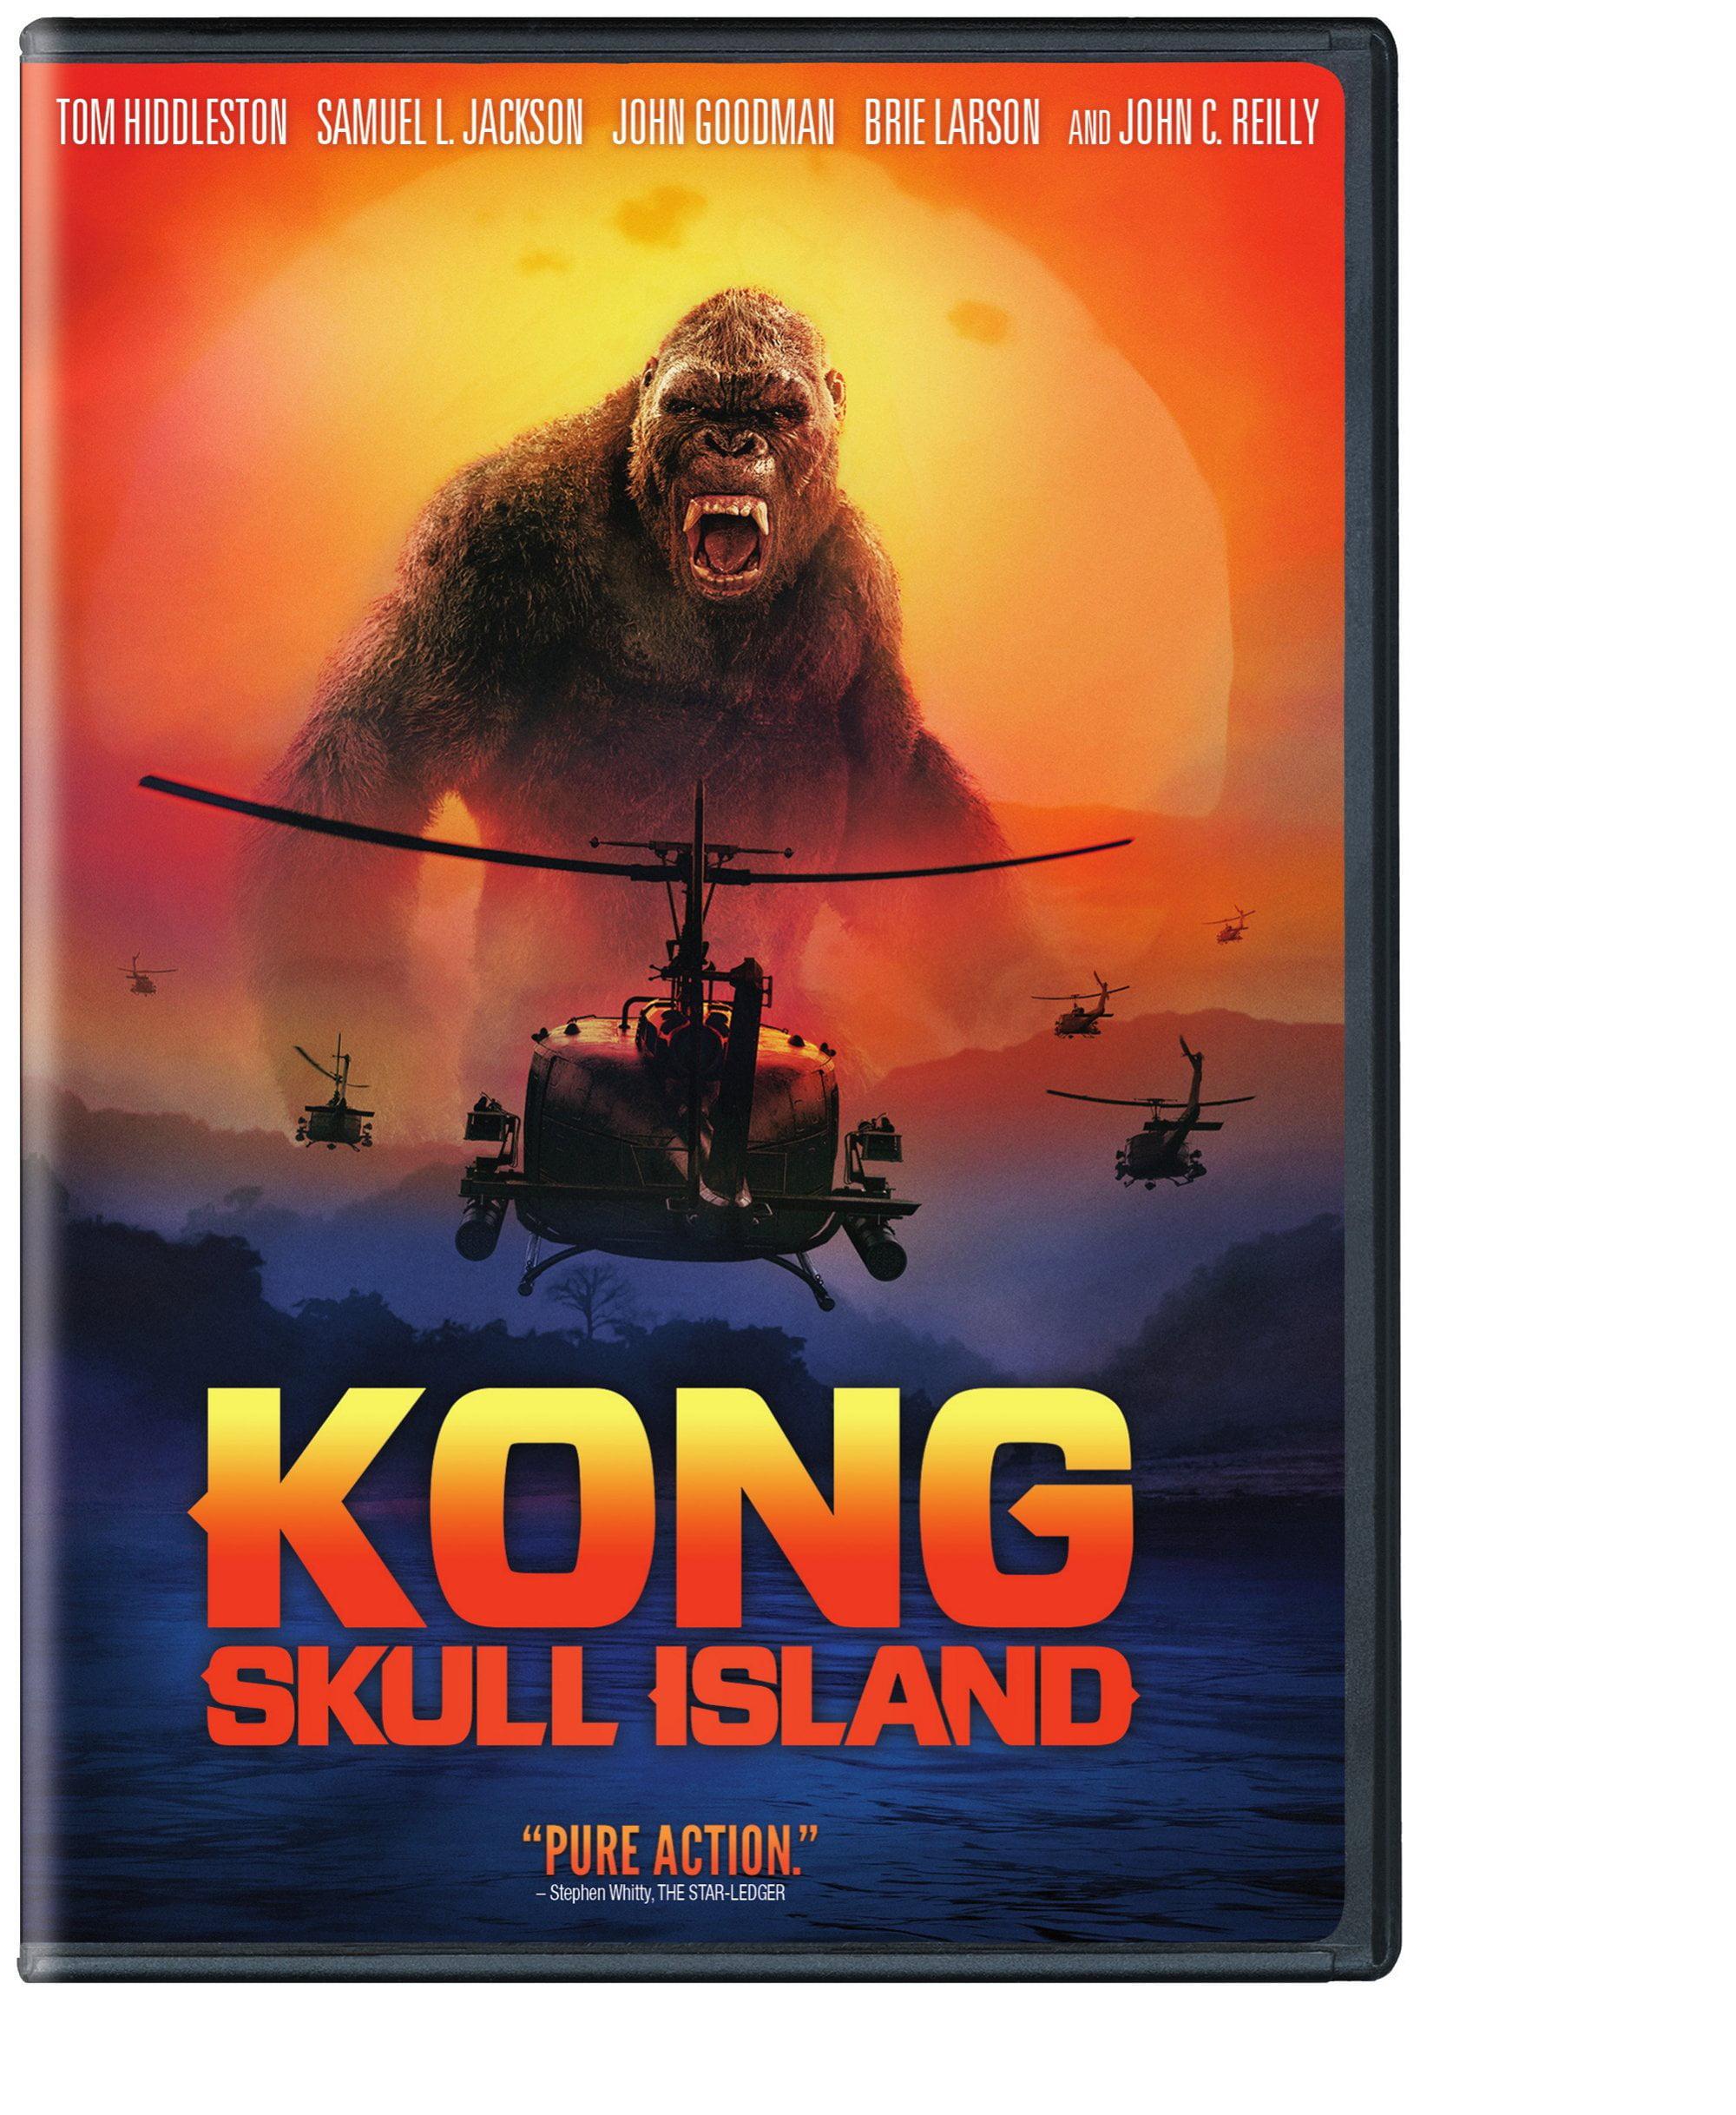 Kong skull island soundtrack on cd - Kong Skull Island Soundtrack On Cd 84